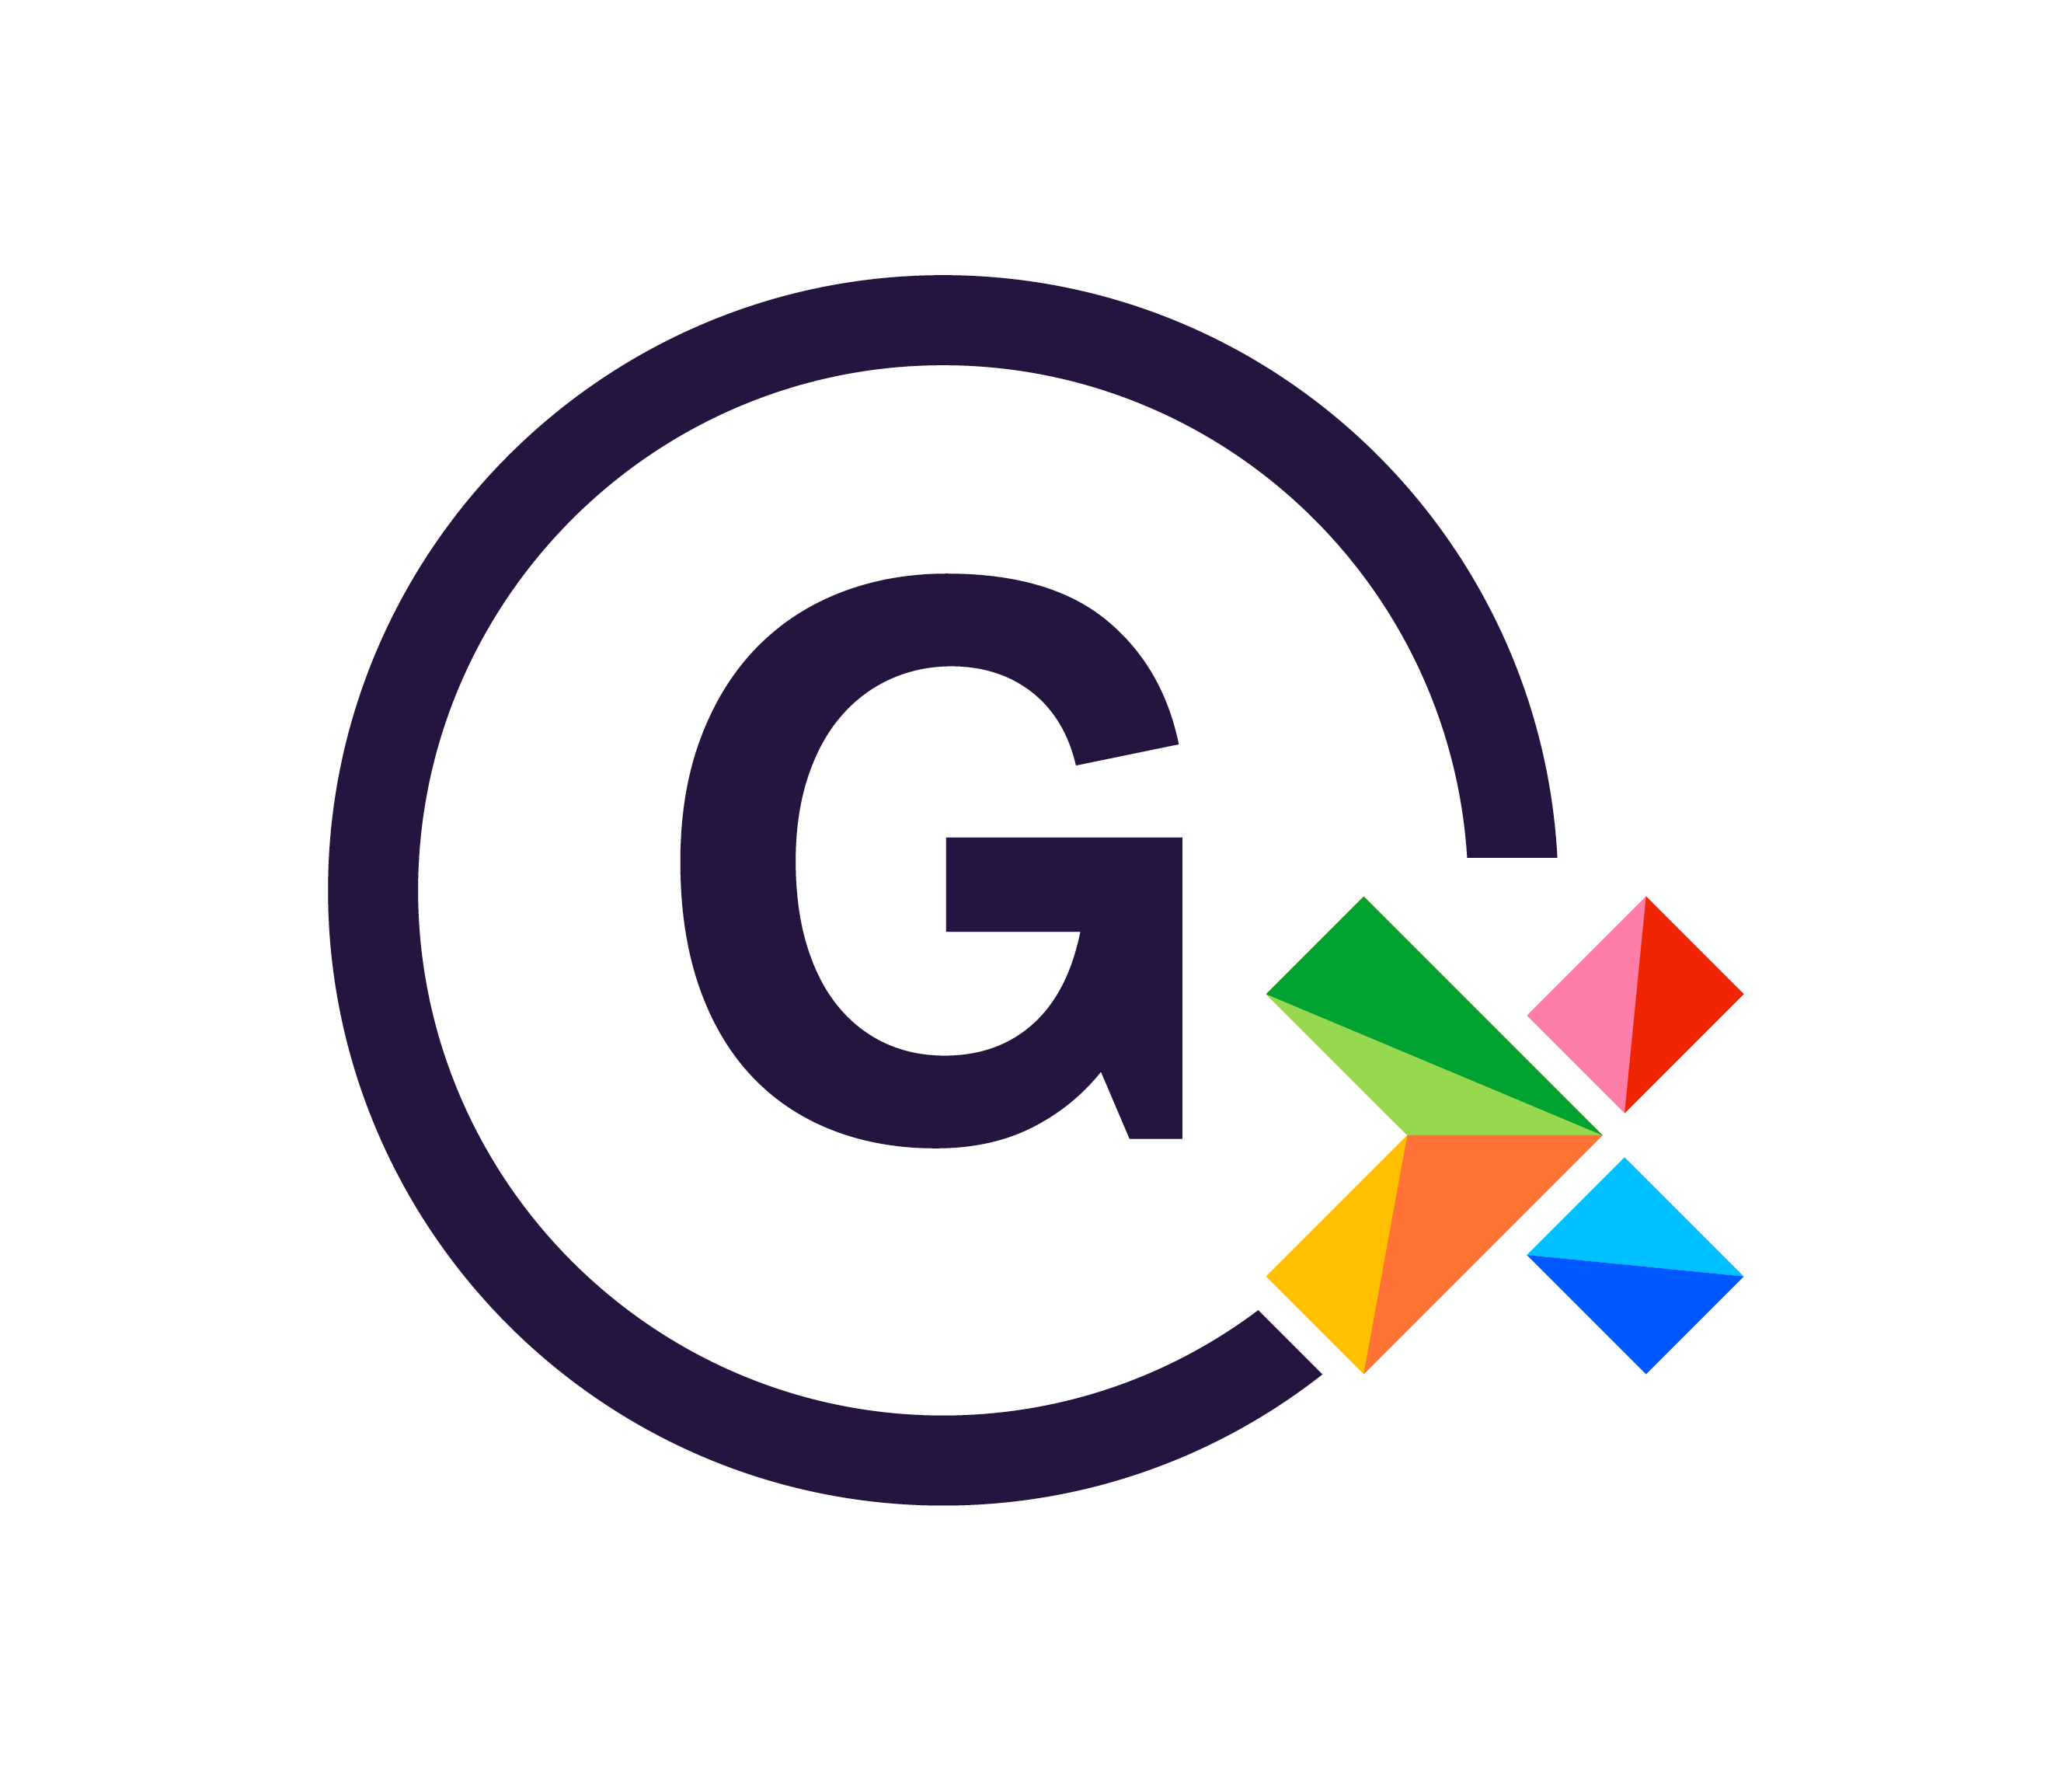 G-symbol